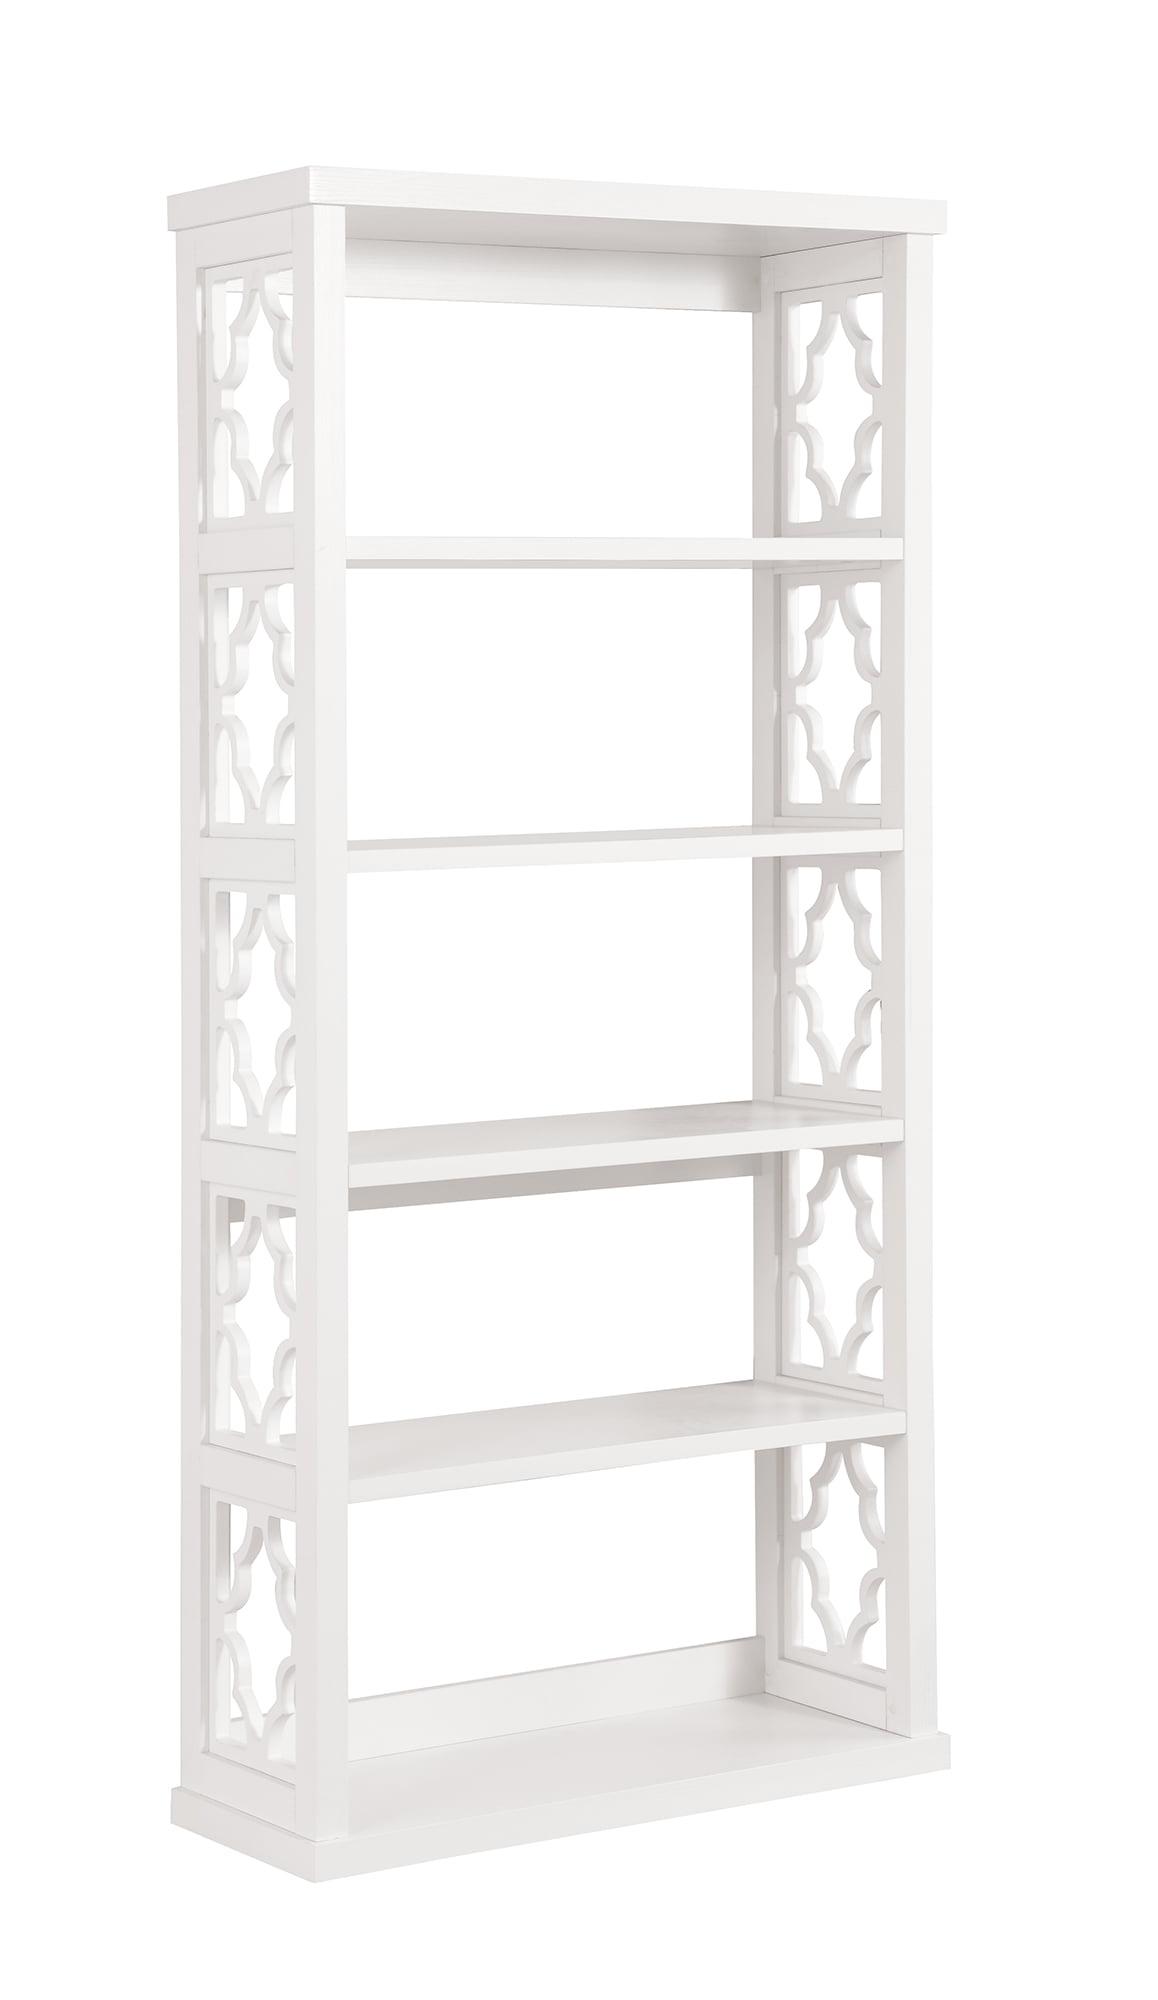 Walmart Furniture Online: Faron Five-Shelf Bookcase, White